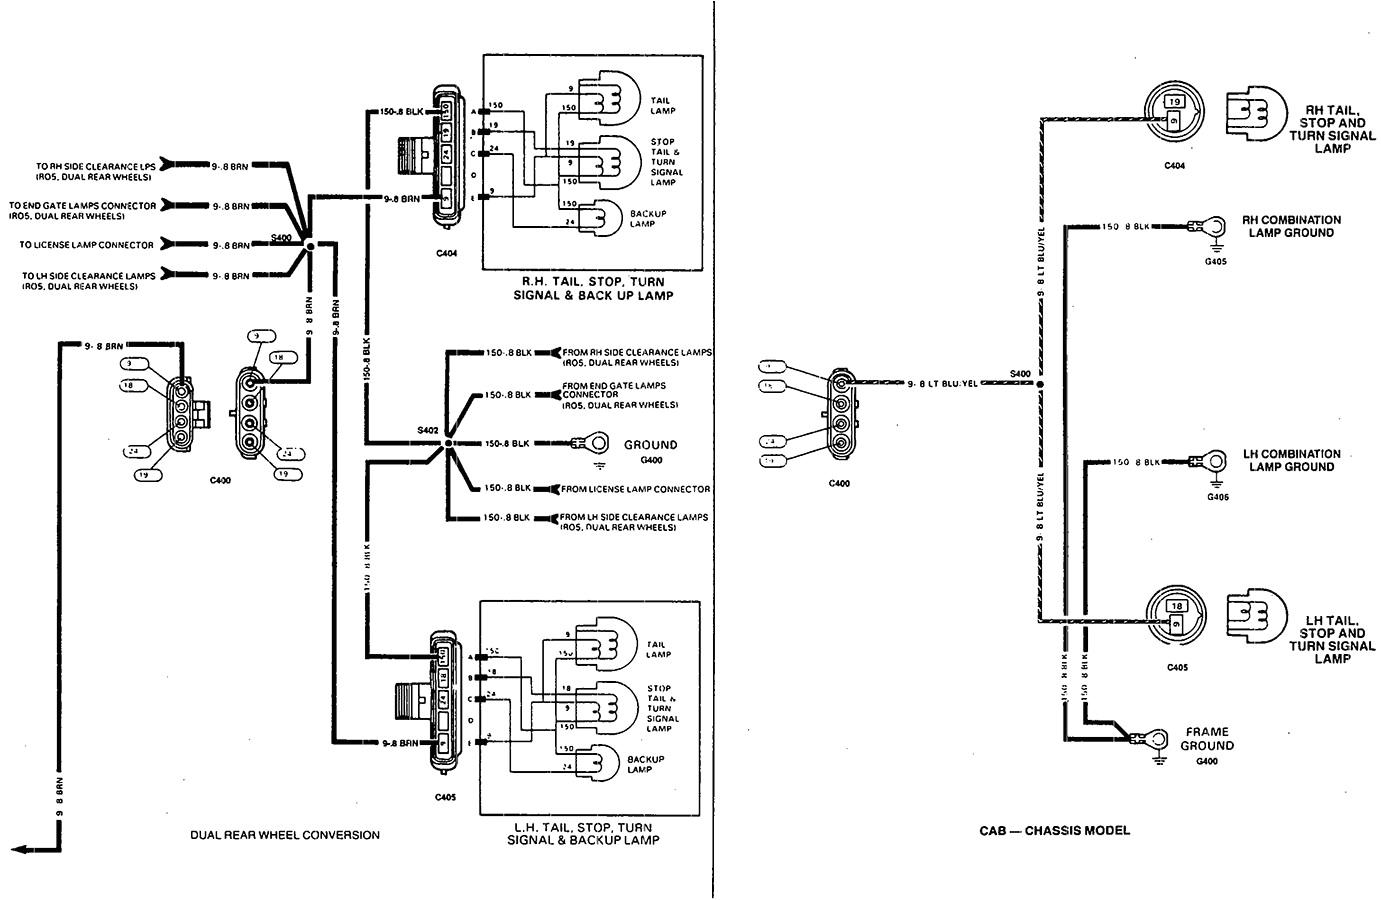 isuzu rodeo wiring diagram tail lights wiring diagram note 2003 isuzu rodeo tail light wiring